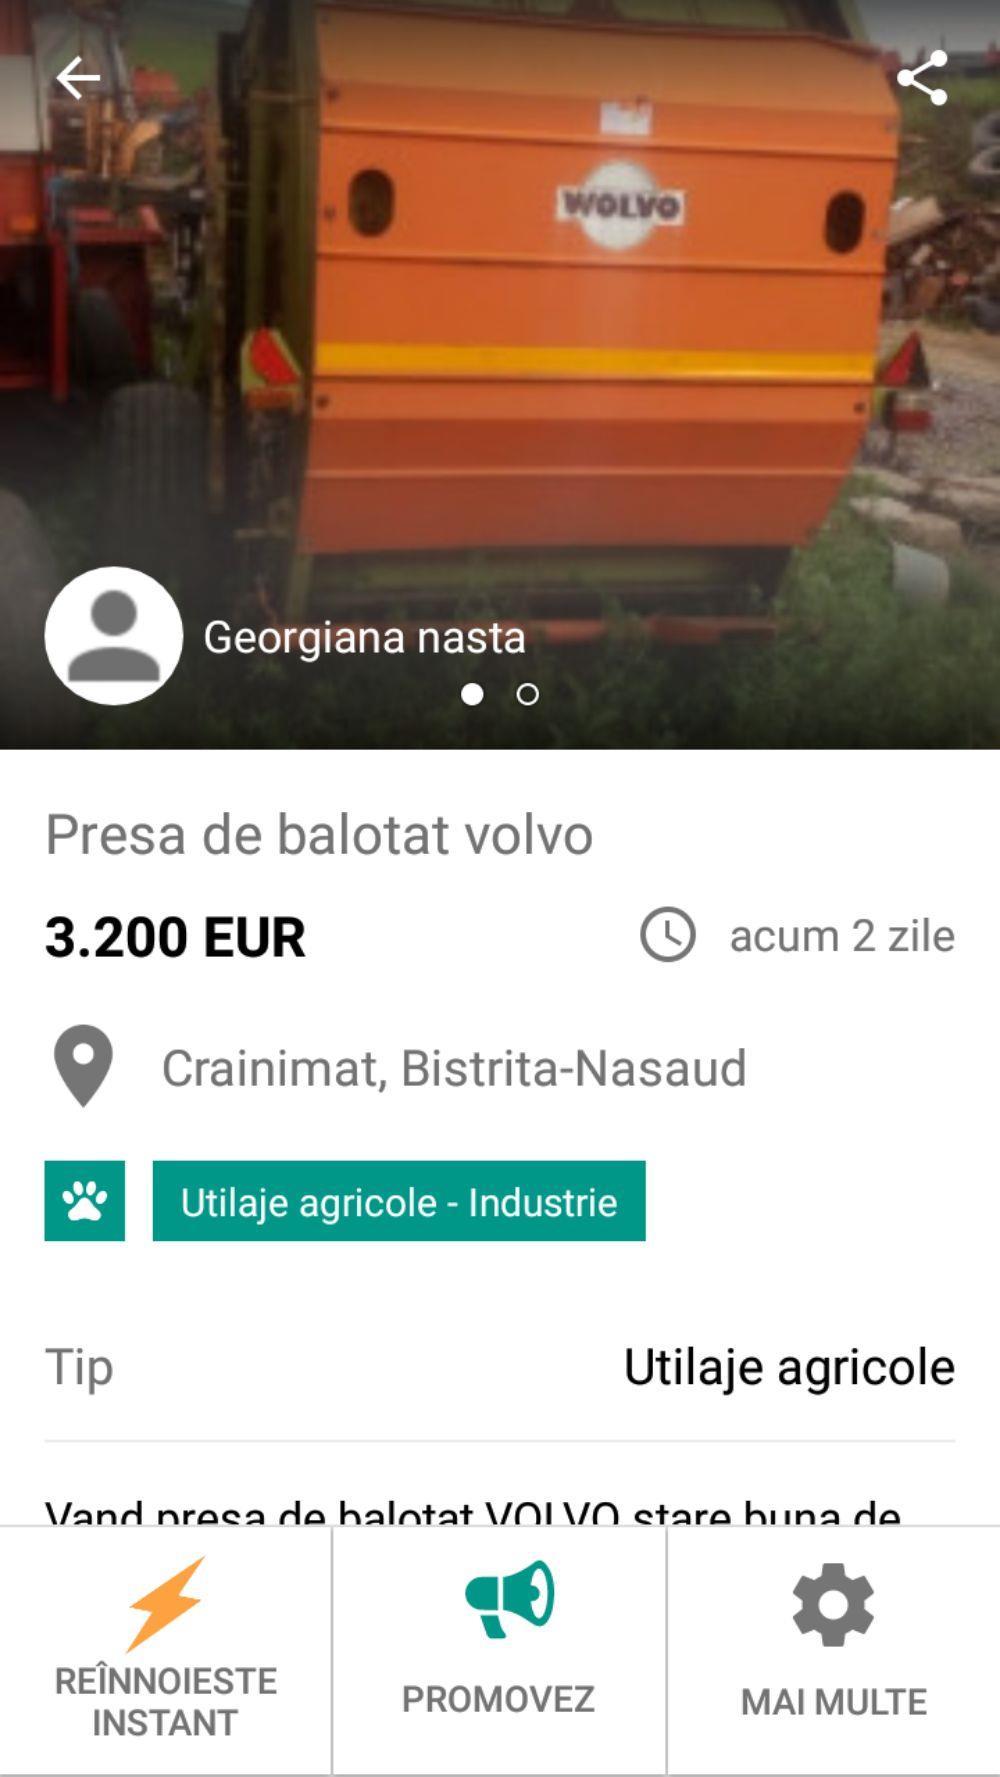 Volvo Presa